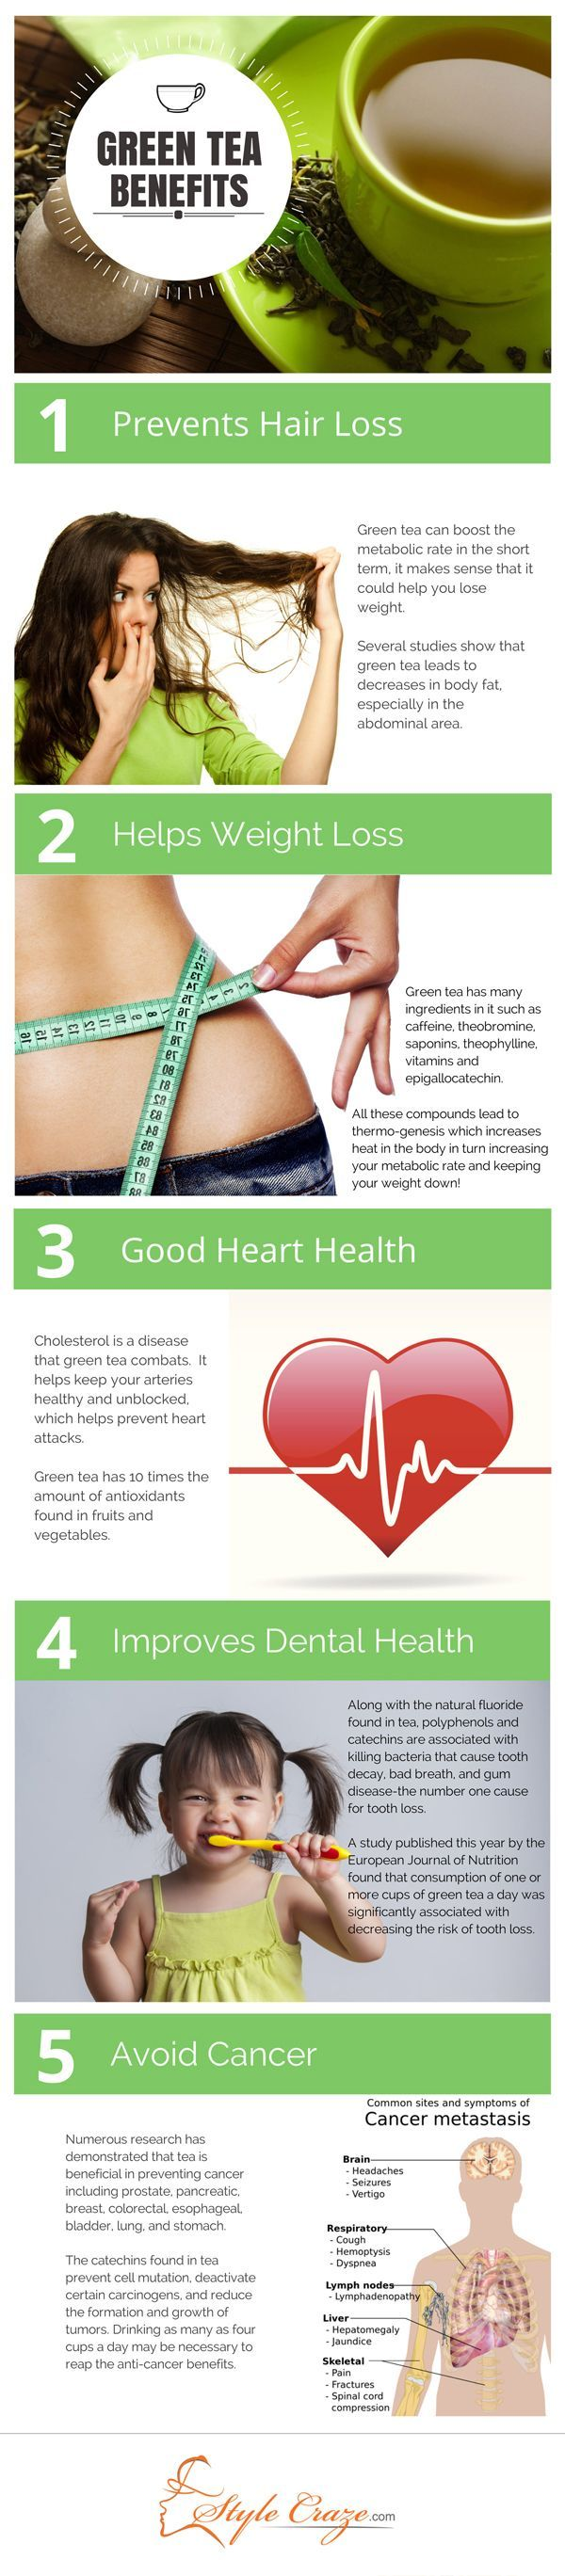 5 Amazing Benefits Of Green Tea  - www.YogaTravelTree.com #findyouryoga